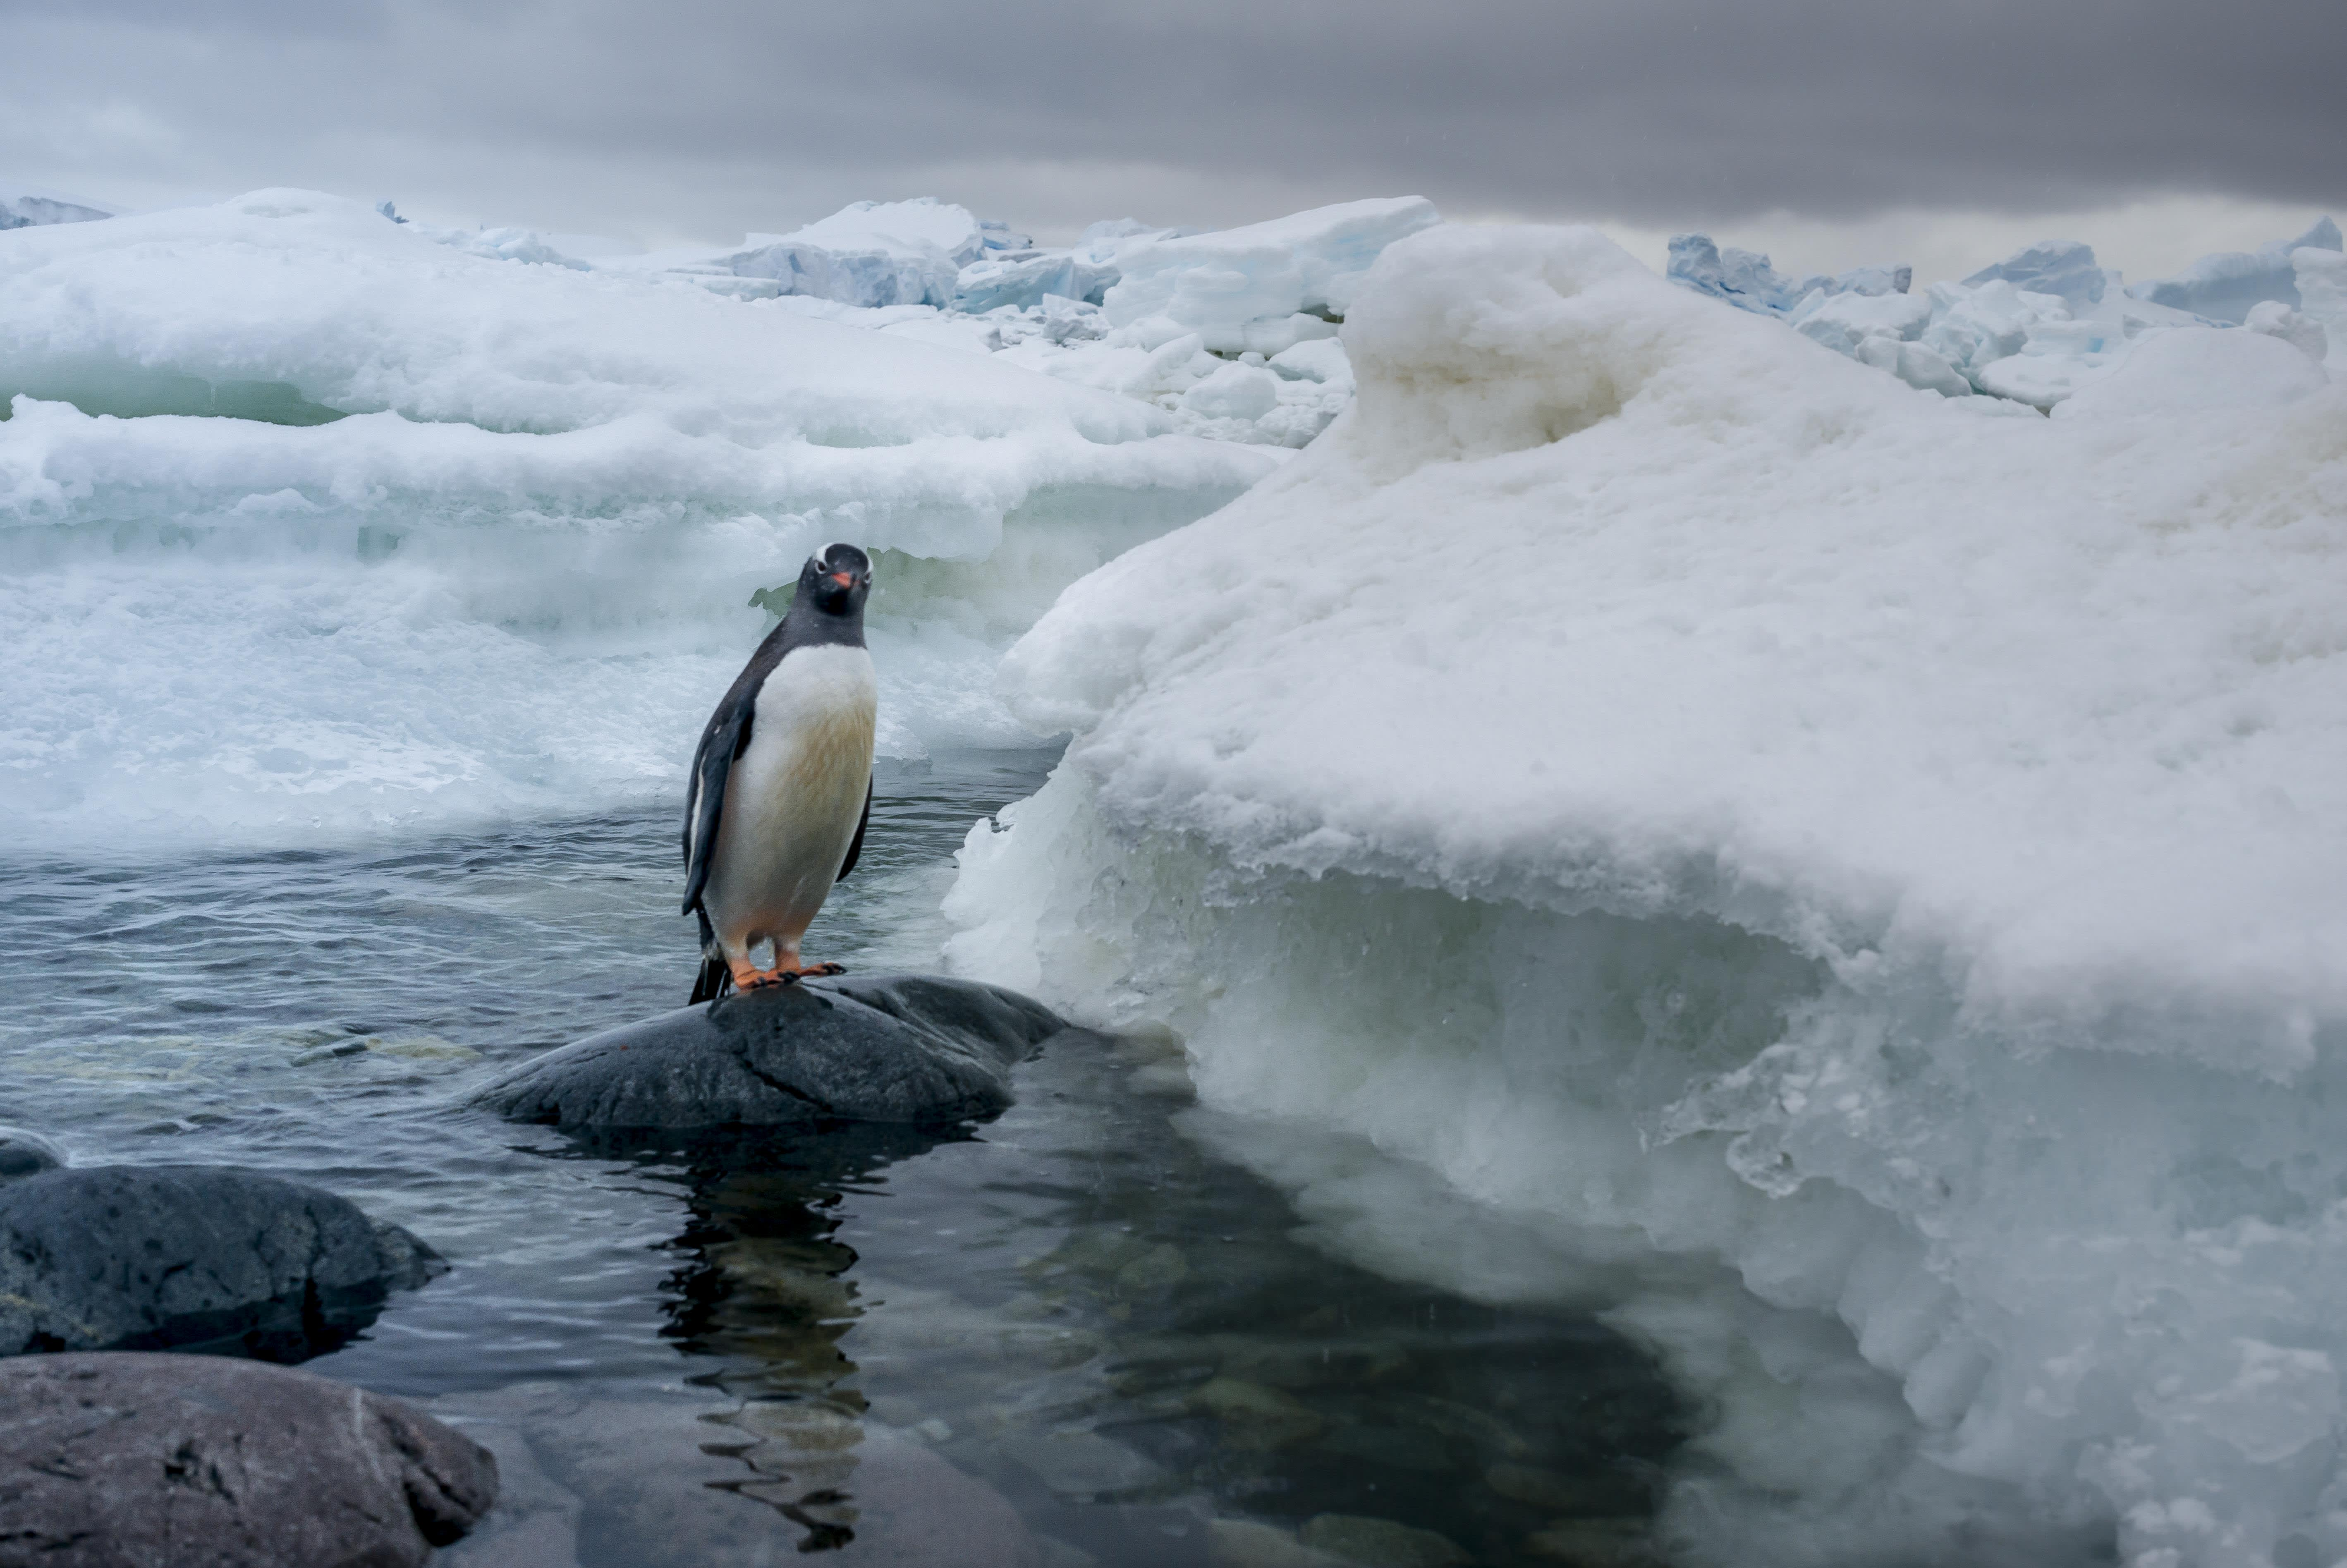 Antarctica registers hottest temperature ever at nearly 65 degrees Fahrenheit